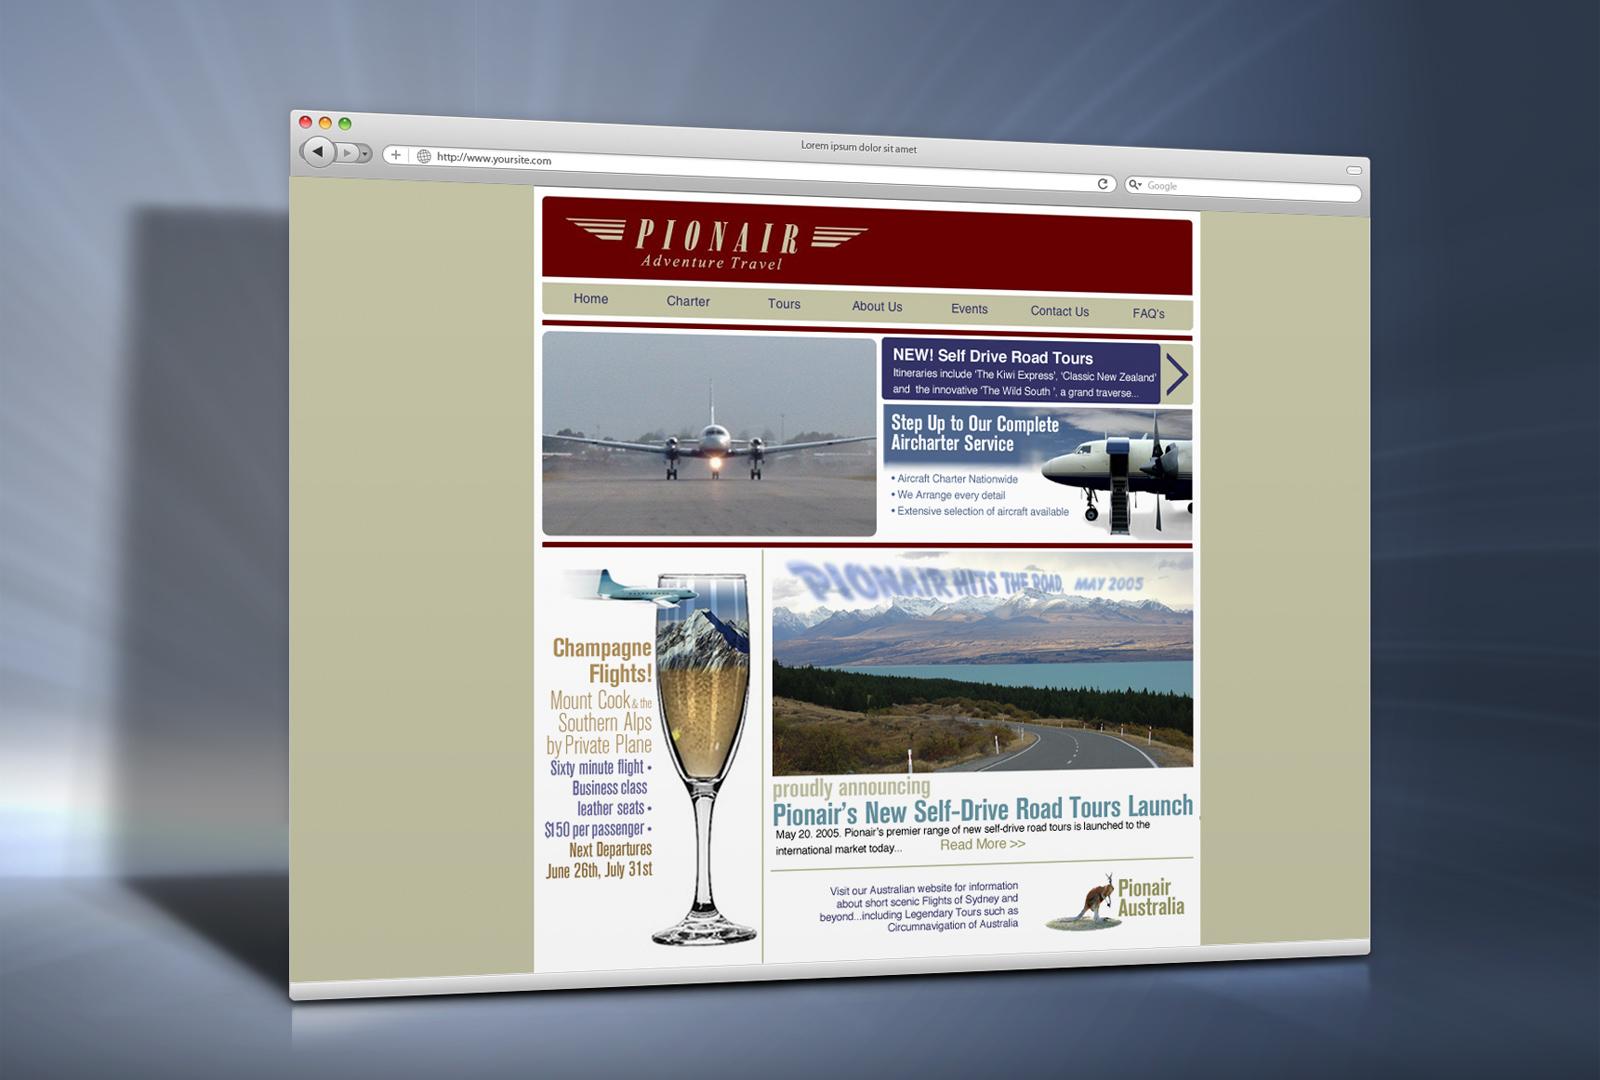 Pionair content managed website, 2004 skin, pre-rebrand.